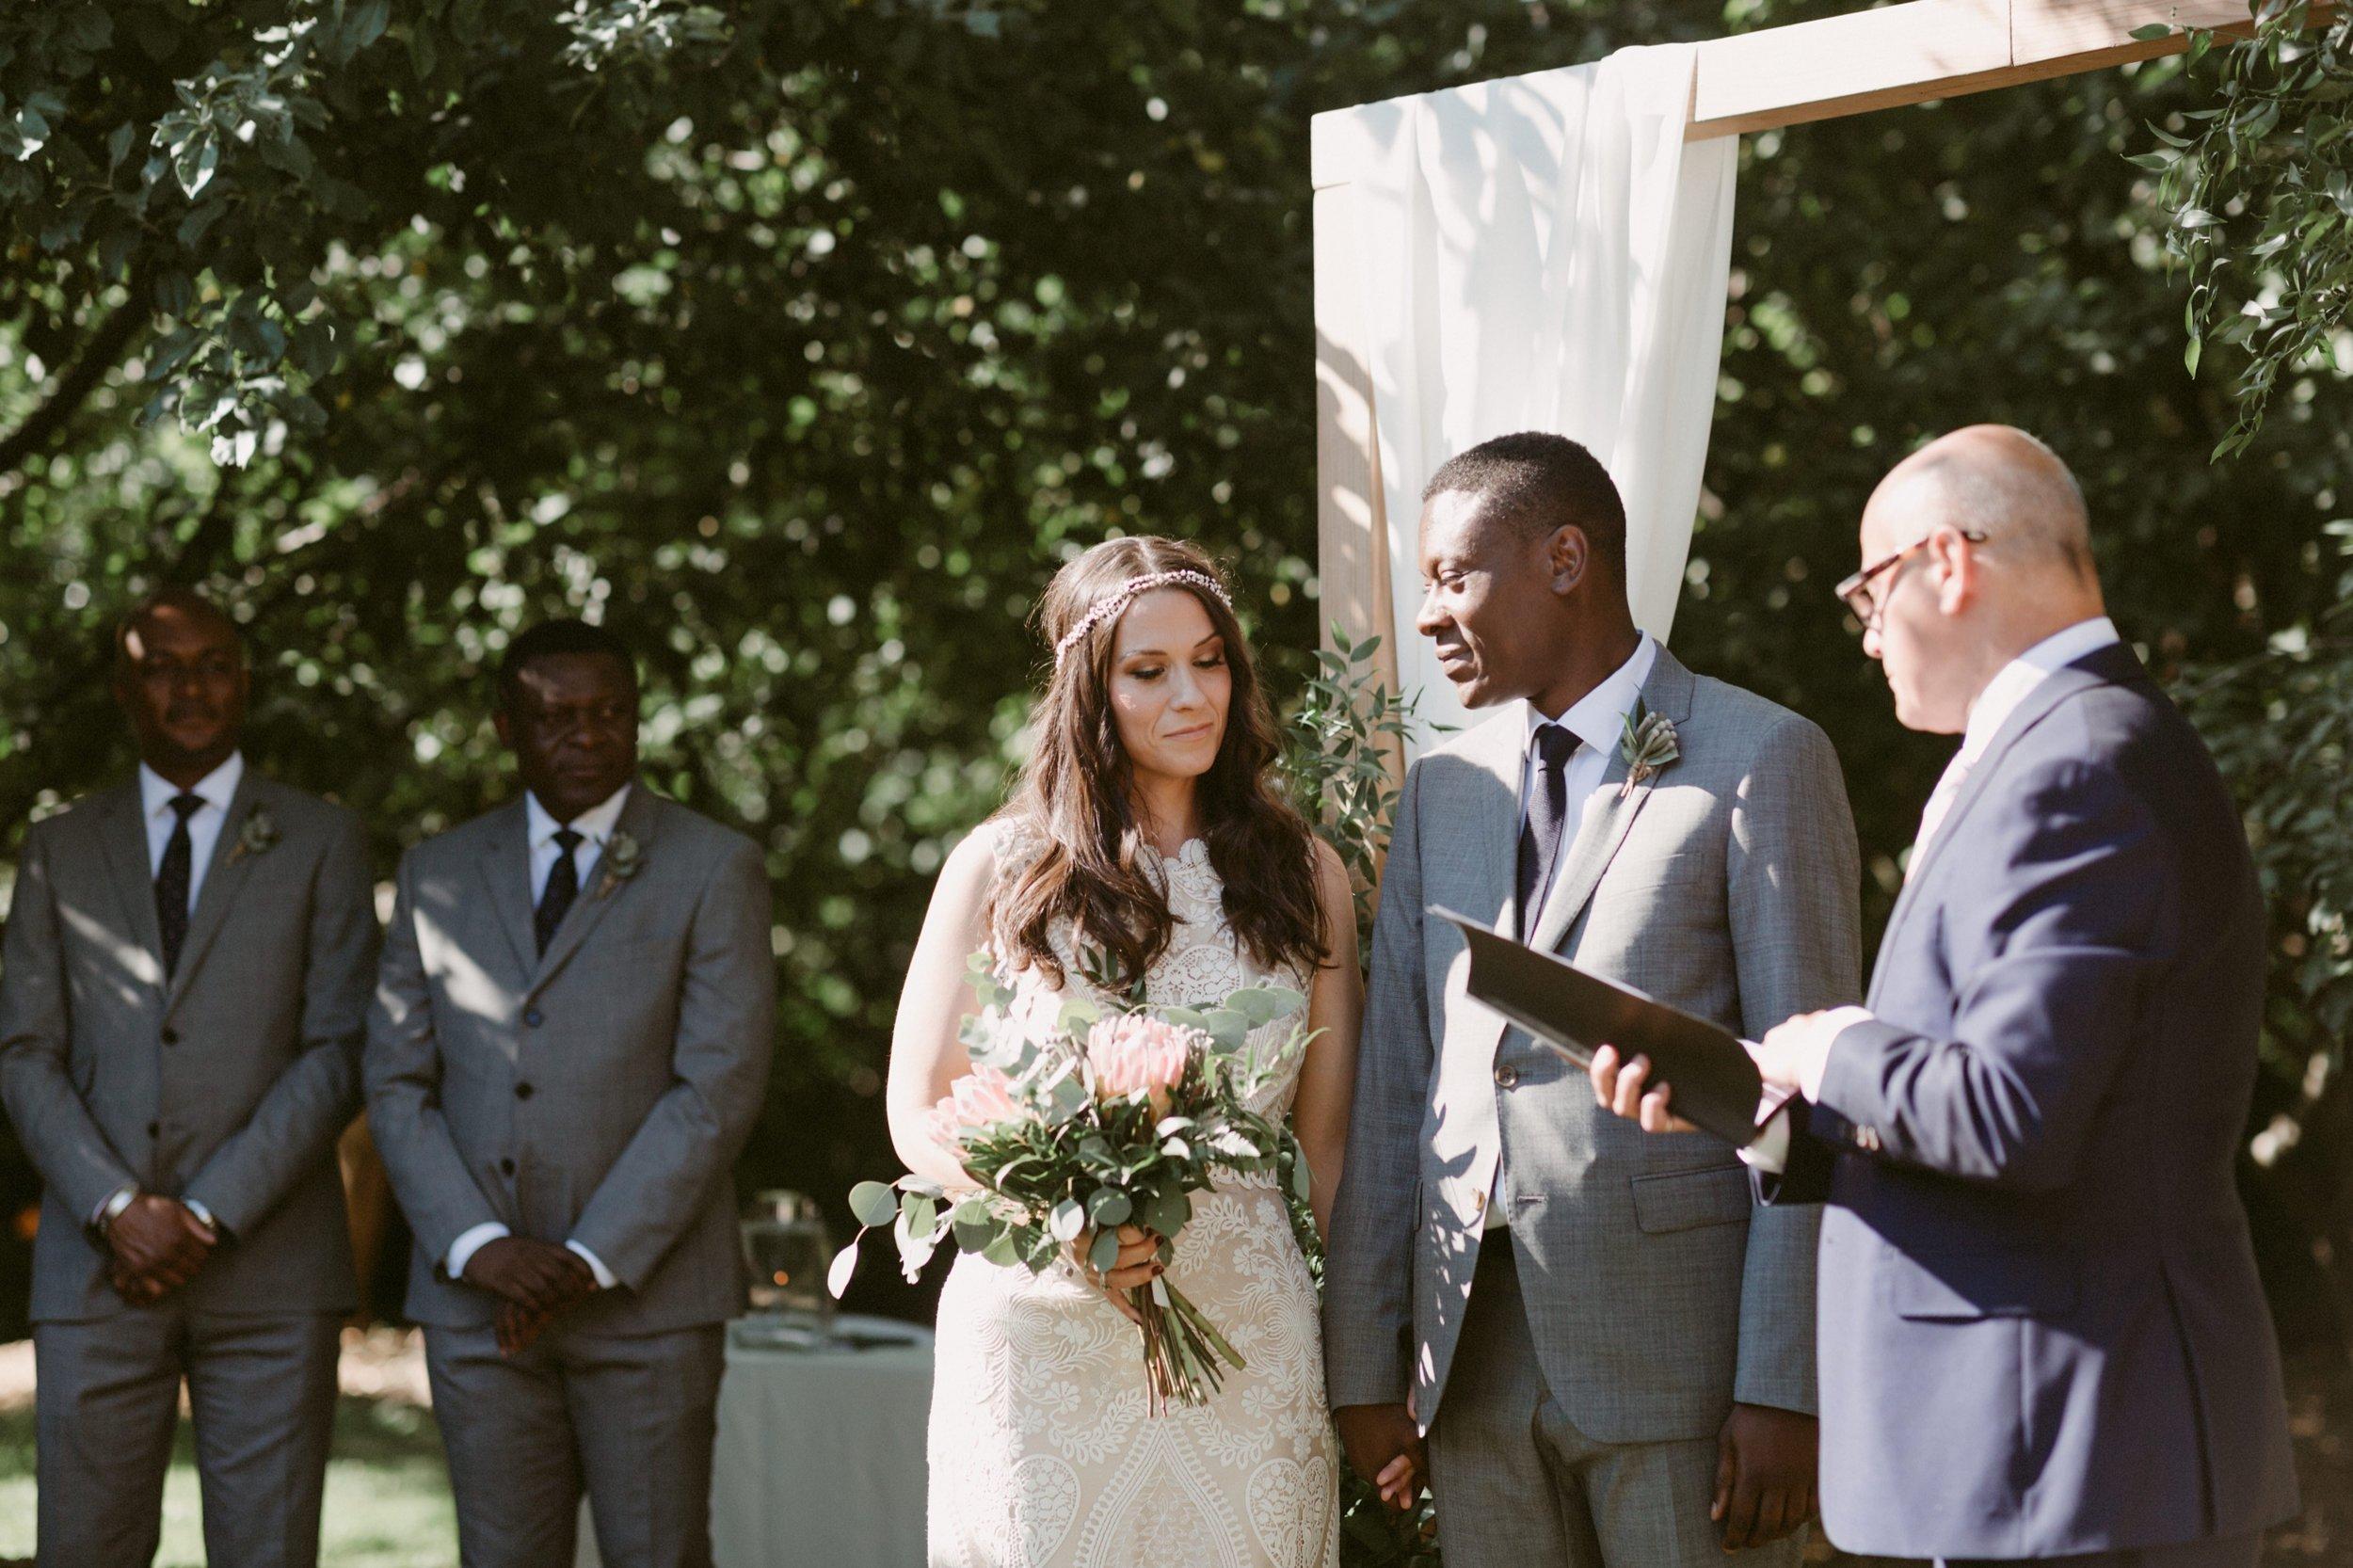 031_Spadina House Wedding (149 of 748)_House_Spadina_intimate_Toronto_Wedding.jpg